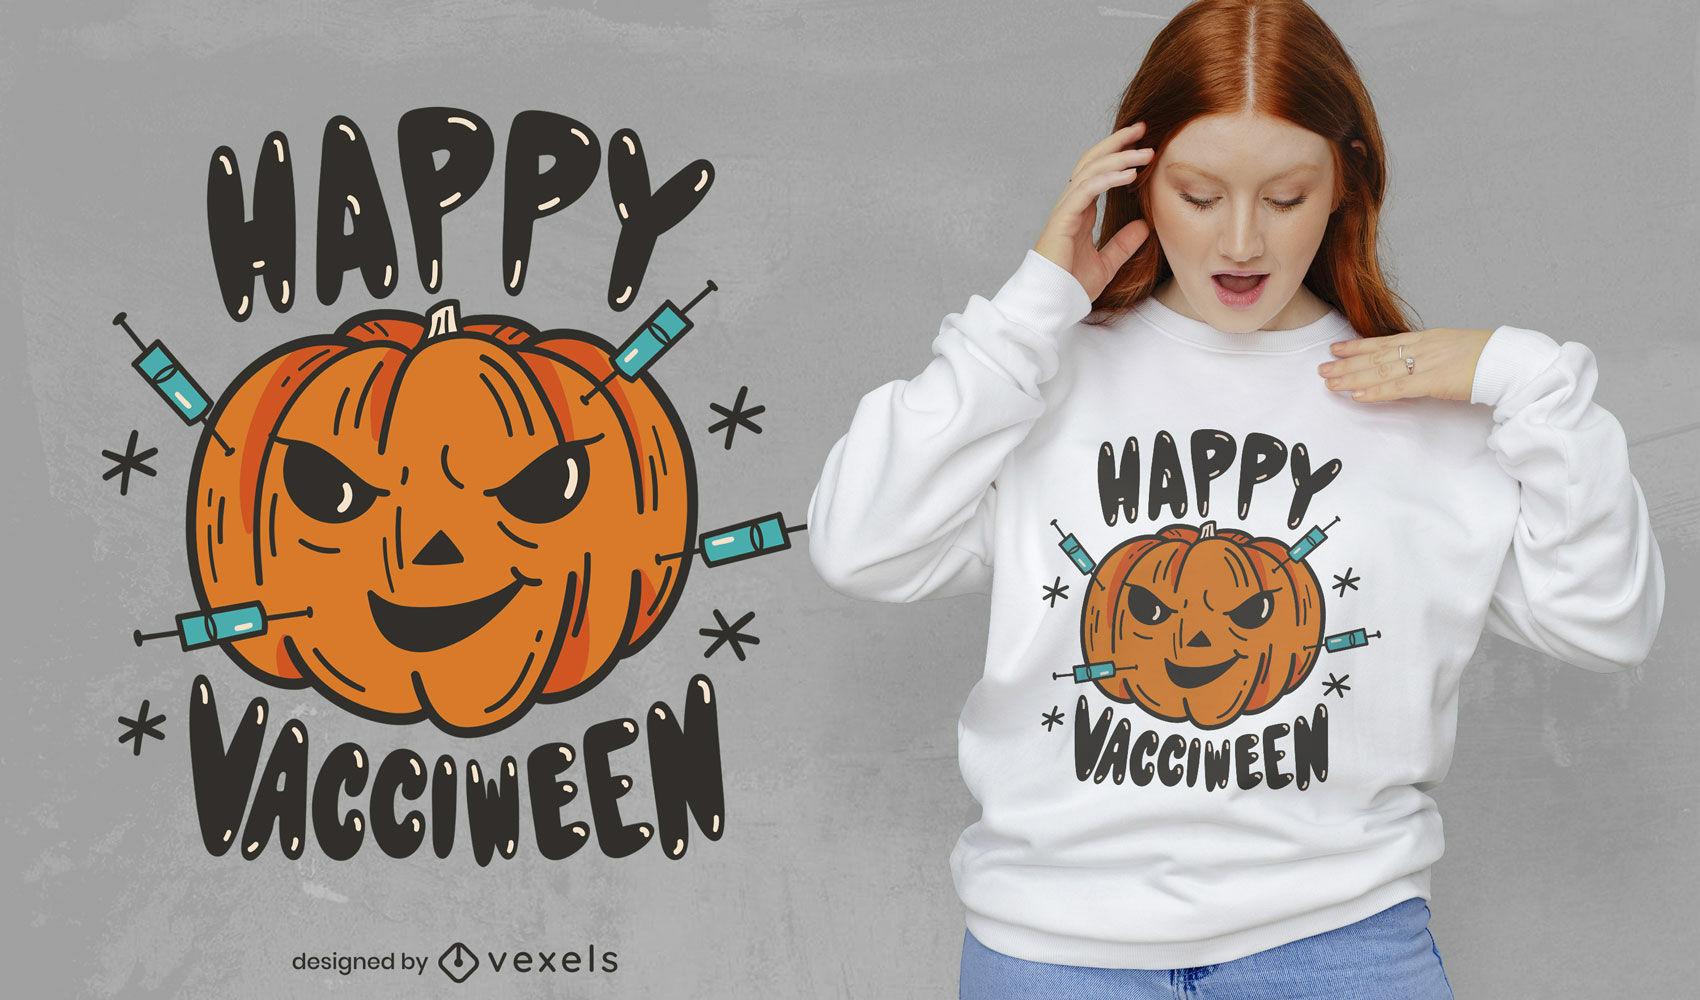 Funny vacciween t-shirt design